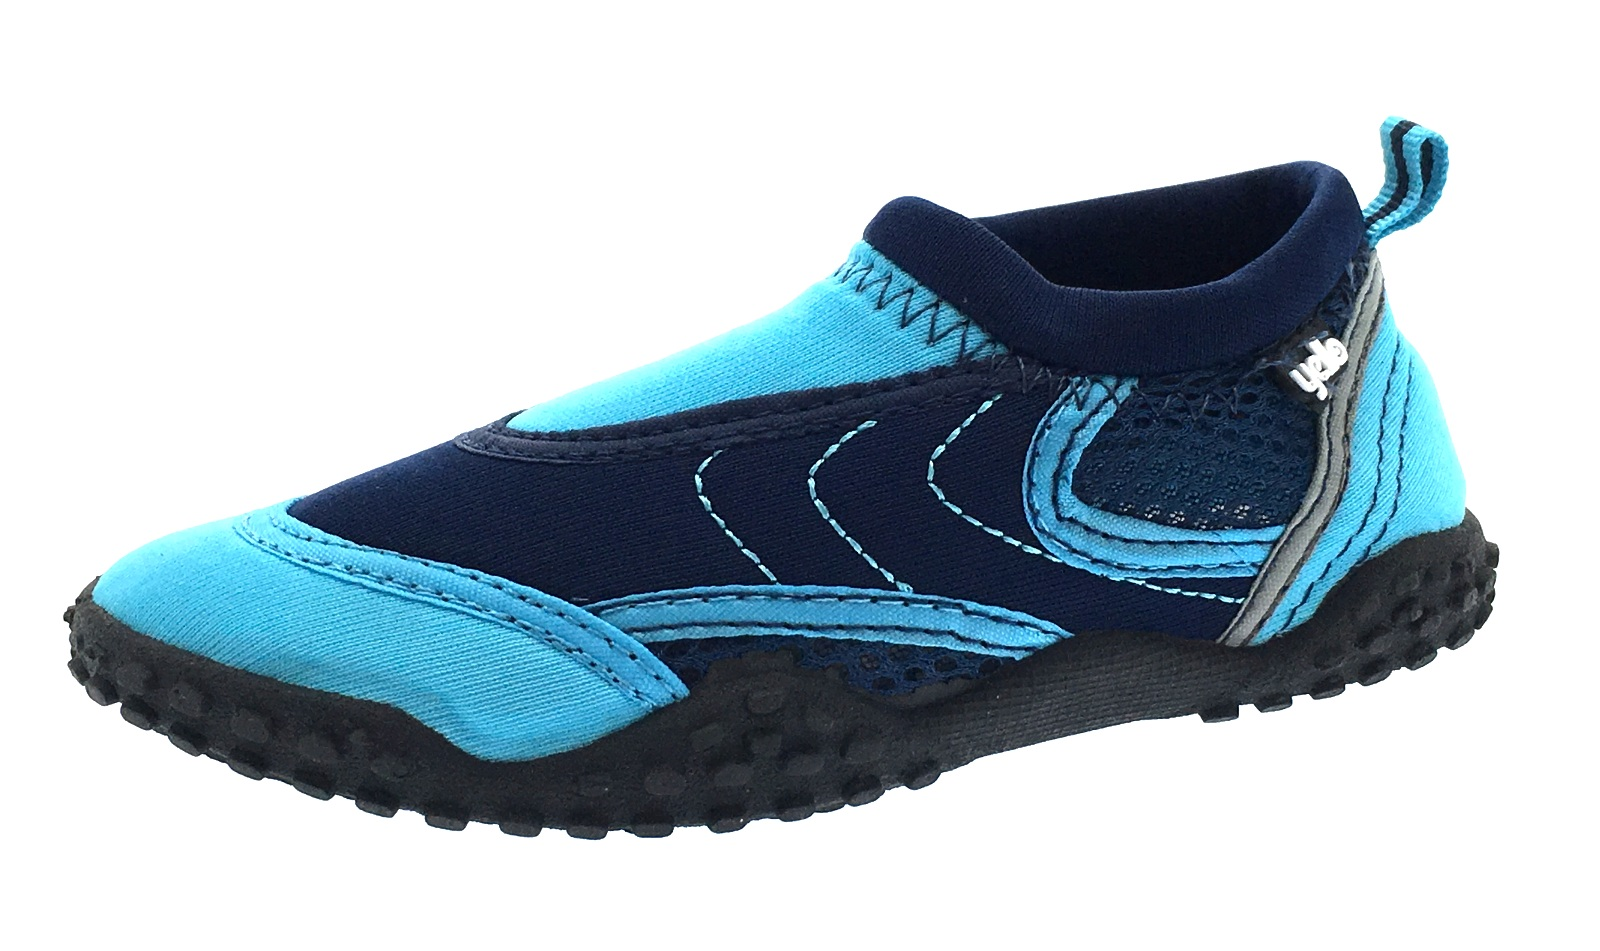 Boys Kids Aqua Socks Beach Water Shoes Wetsuit Swim Surf Protection Sandals